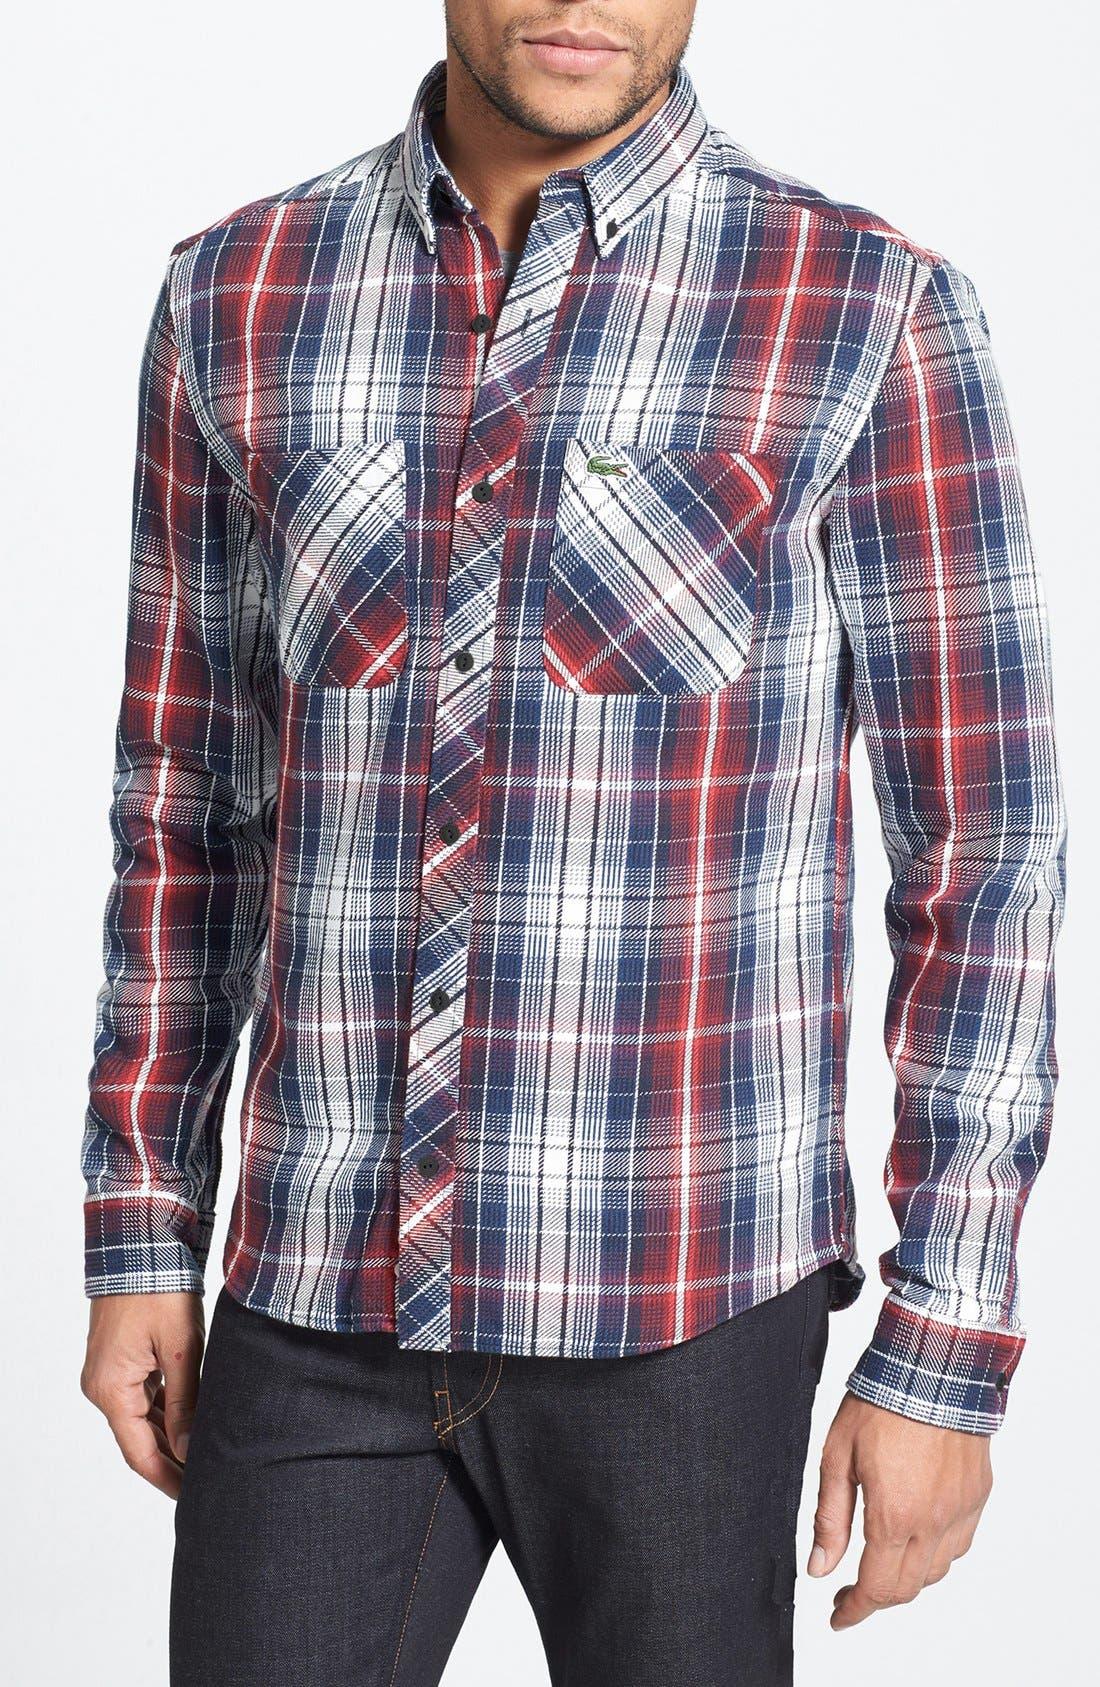 Main Image - Lacoste L!VE Plaid Twill Shirt